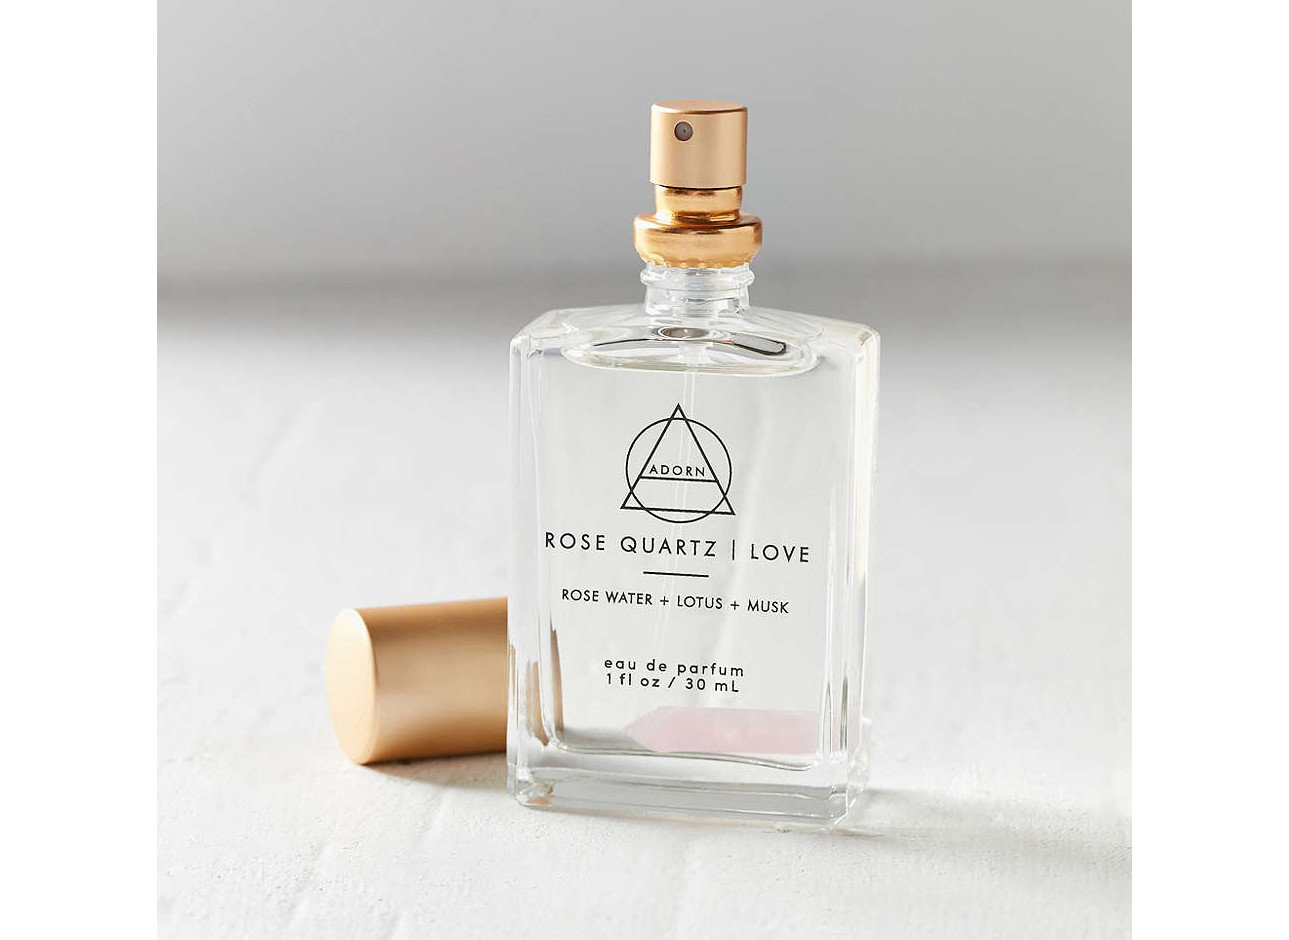 Beauty perfume toiletry distilled beverage cosmetics glass bottle bottle plastic